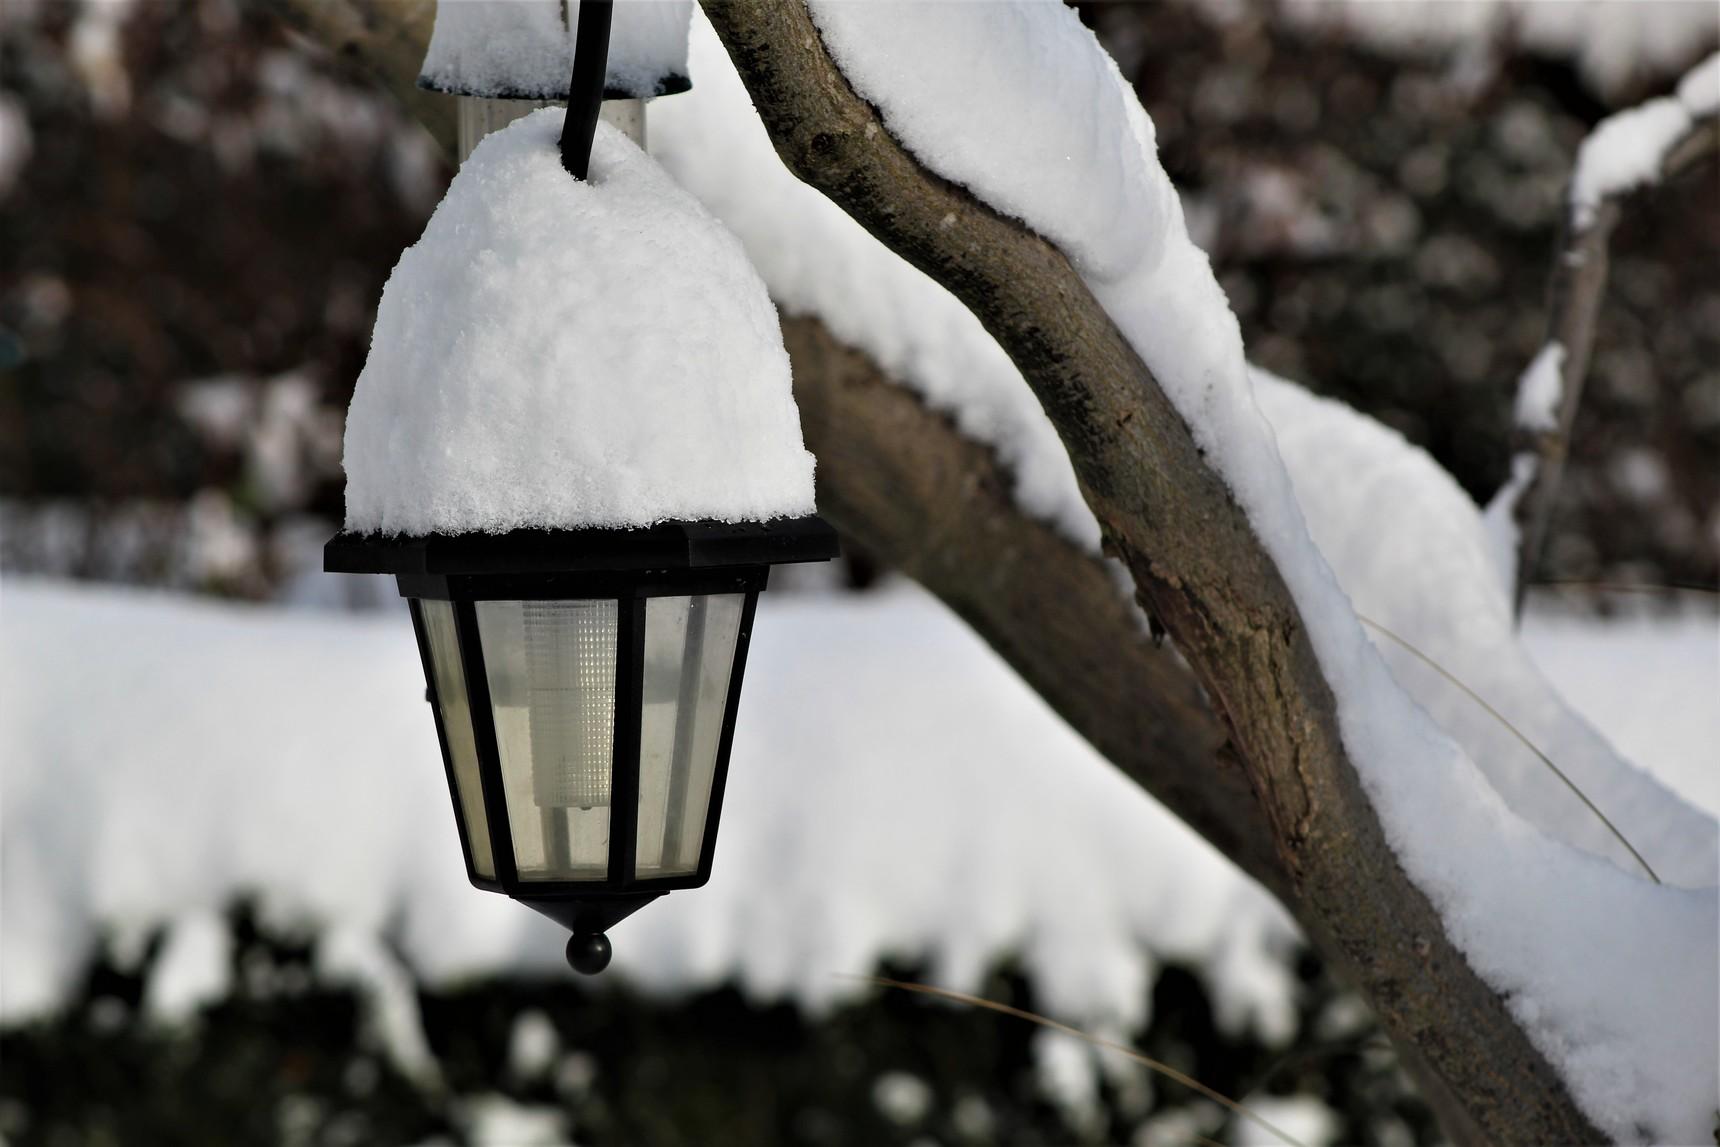 Snow lamp!